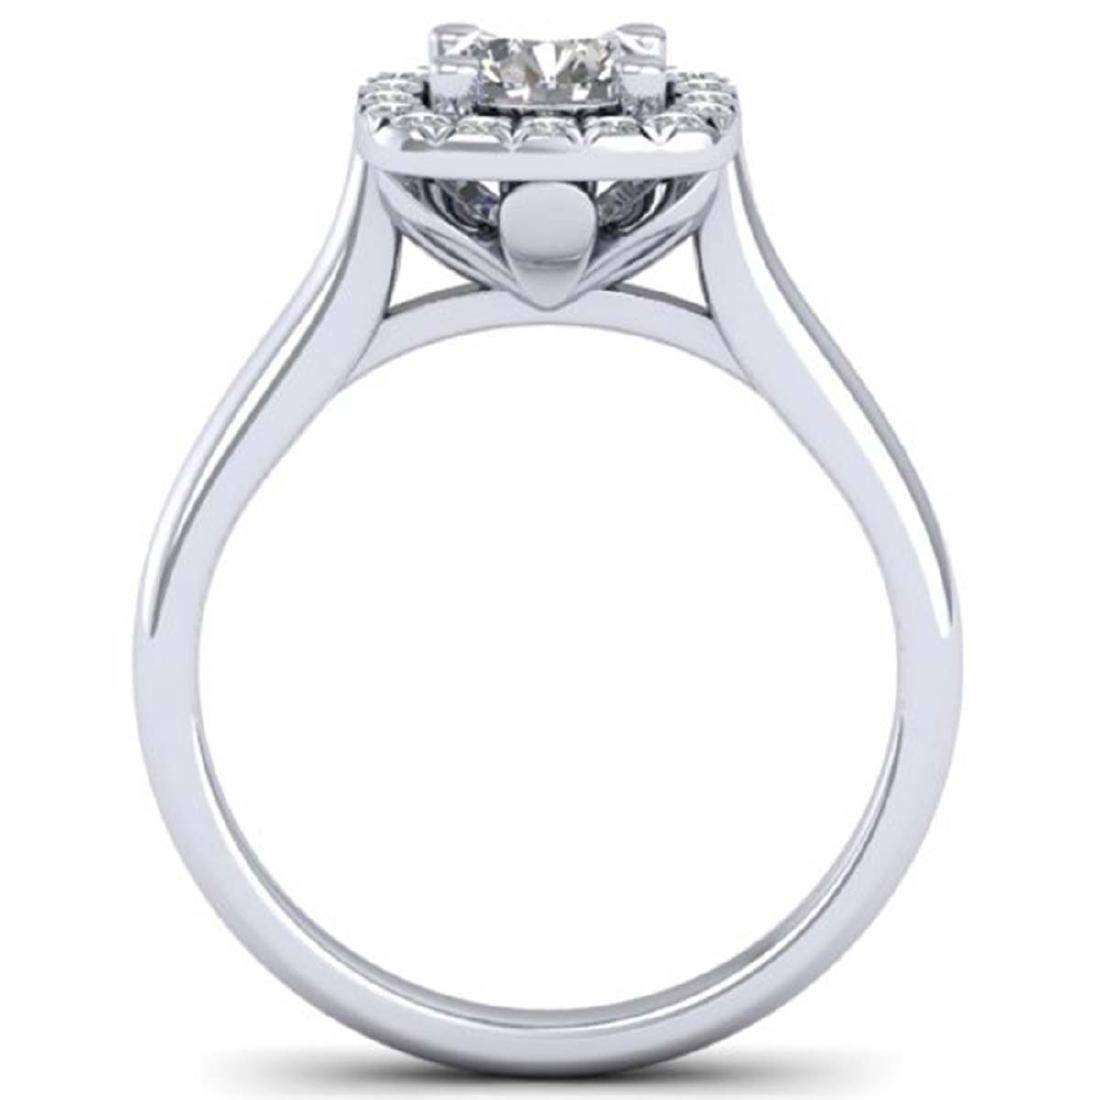 1.01 ctw VS/SI Diamond Solitaire Halo Ring 18K White - 3